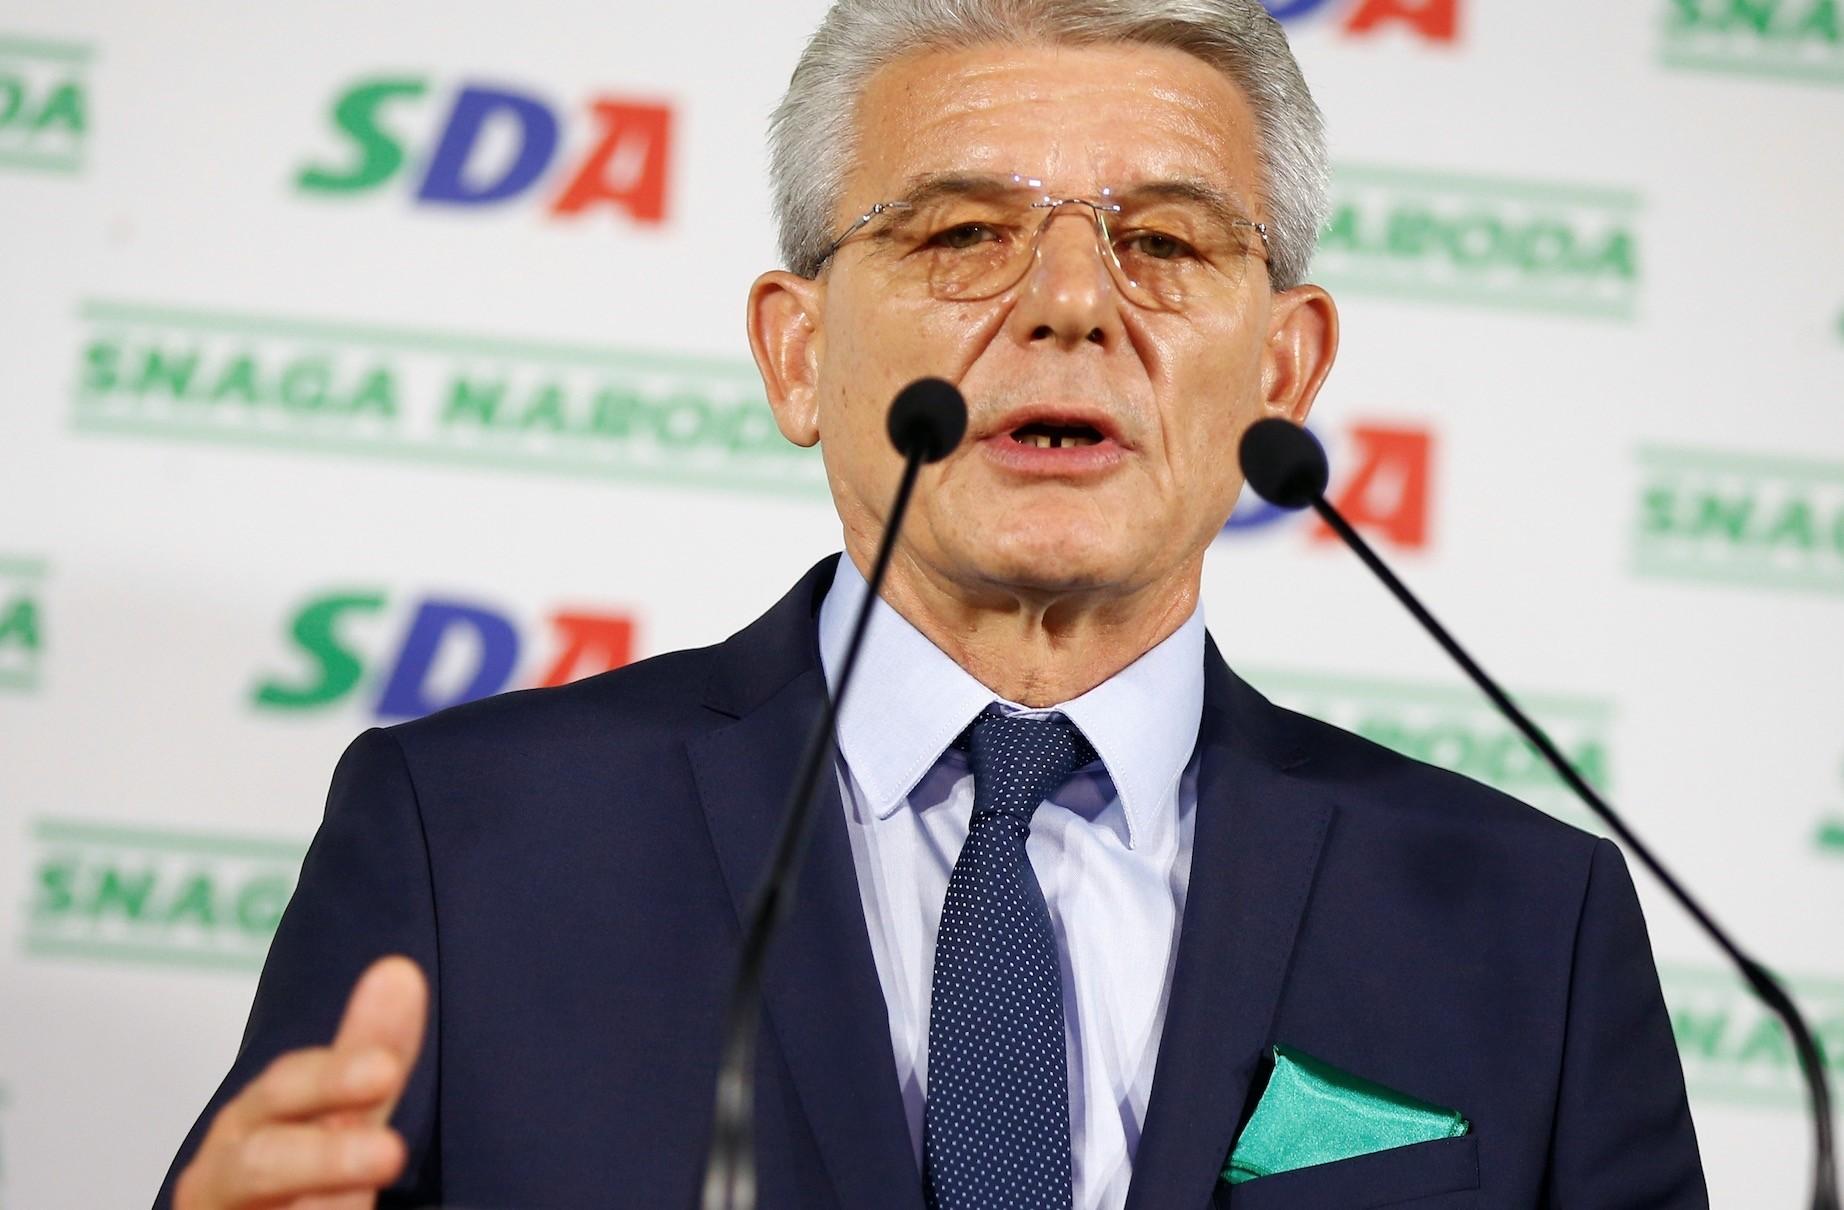 Sefik Dzaferovic attends a news conference where he declared himself the winner of the Bosniak seat of the tripartite Bosnian presidency, Sarajevo, Oct. 7.